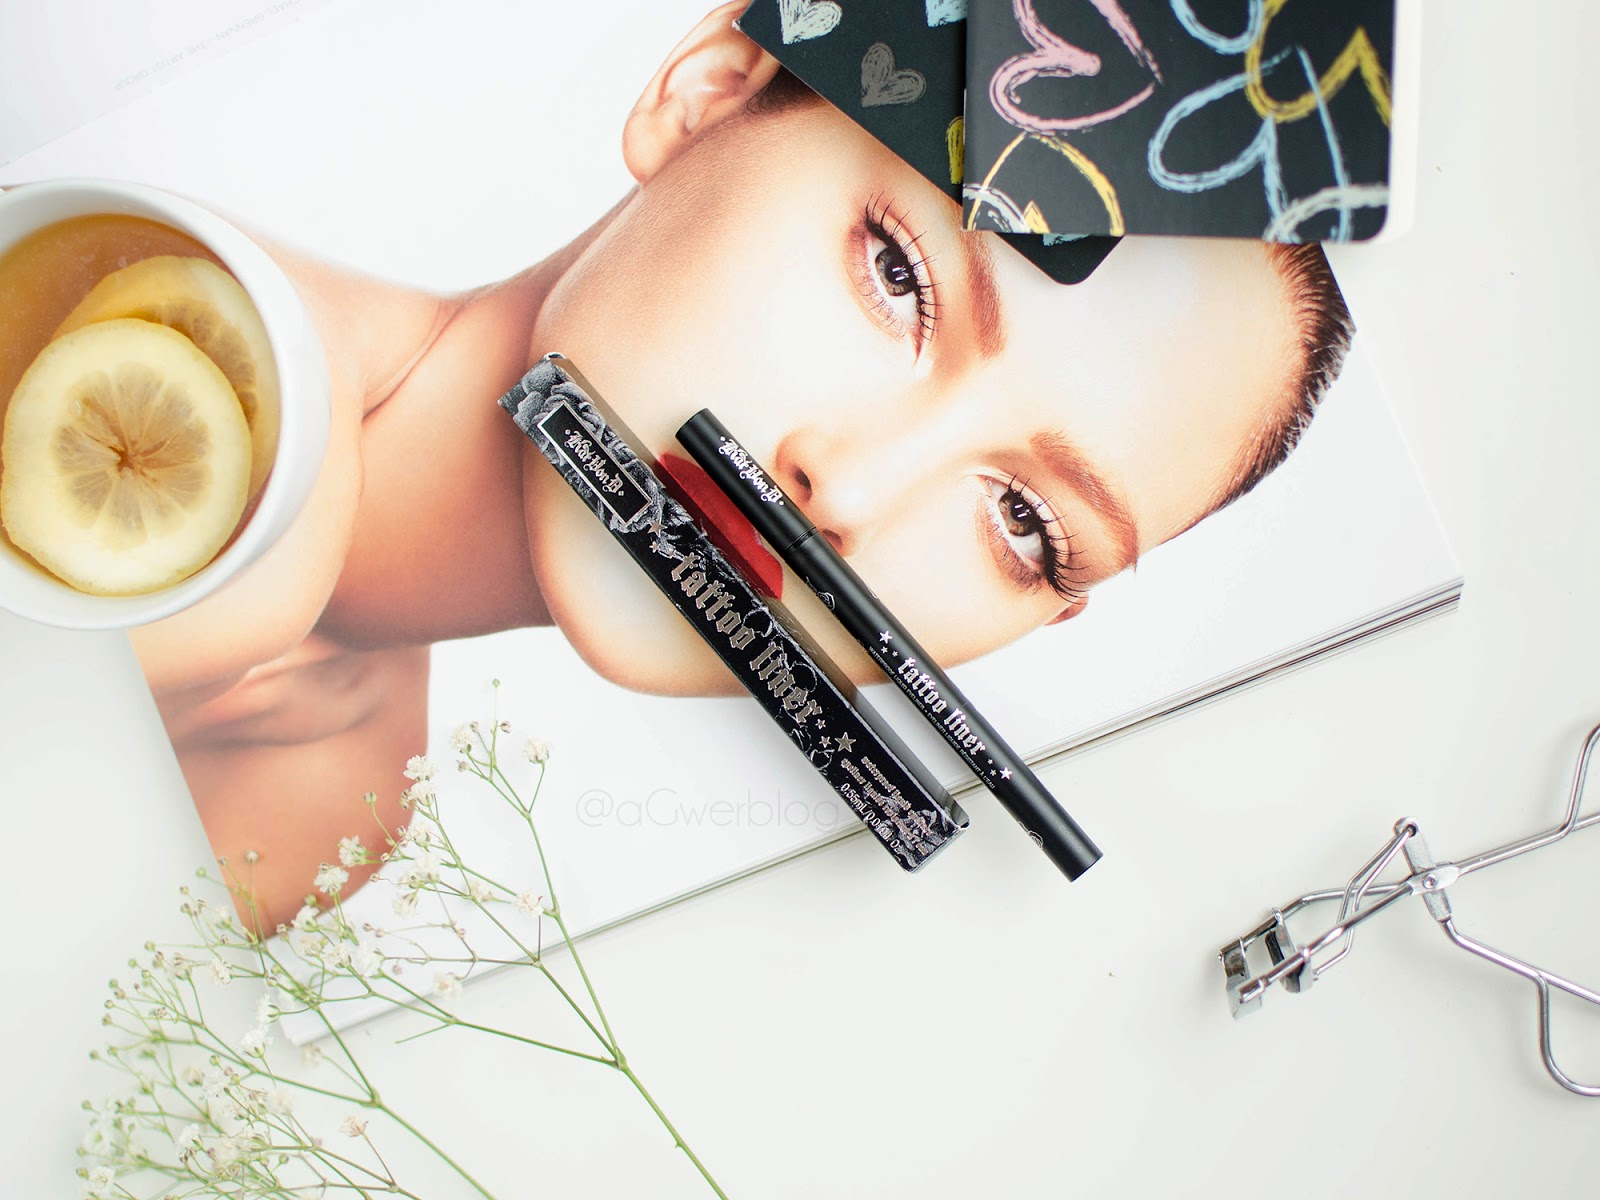 Kat Von D Tattoo Liner | najlepszy eyeliner